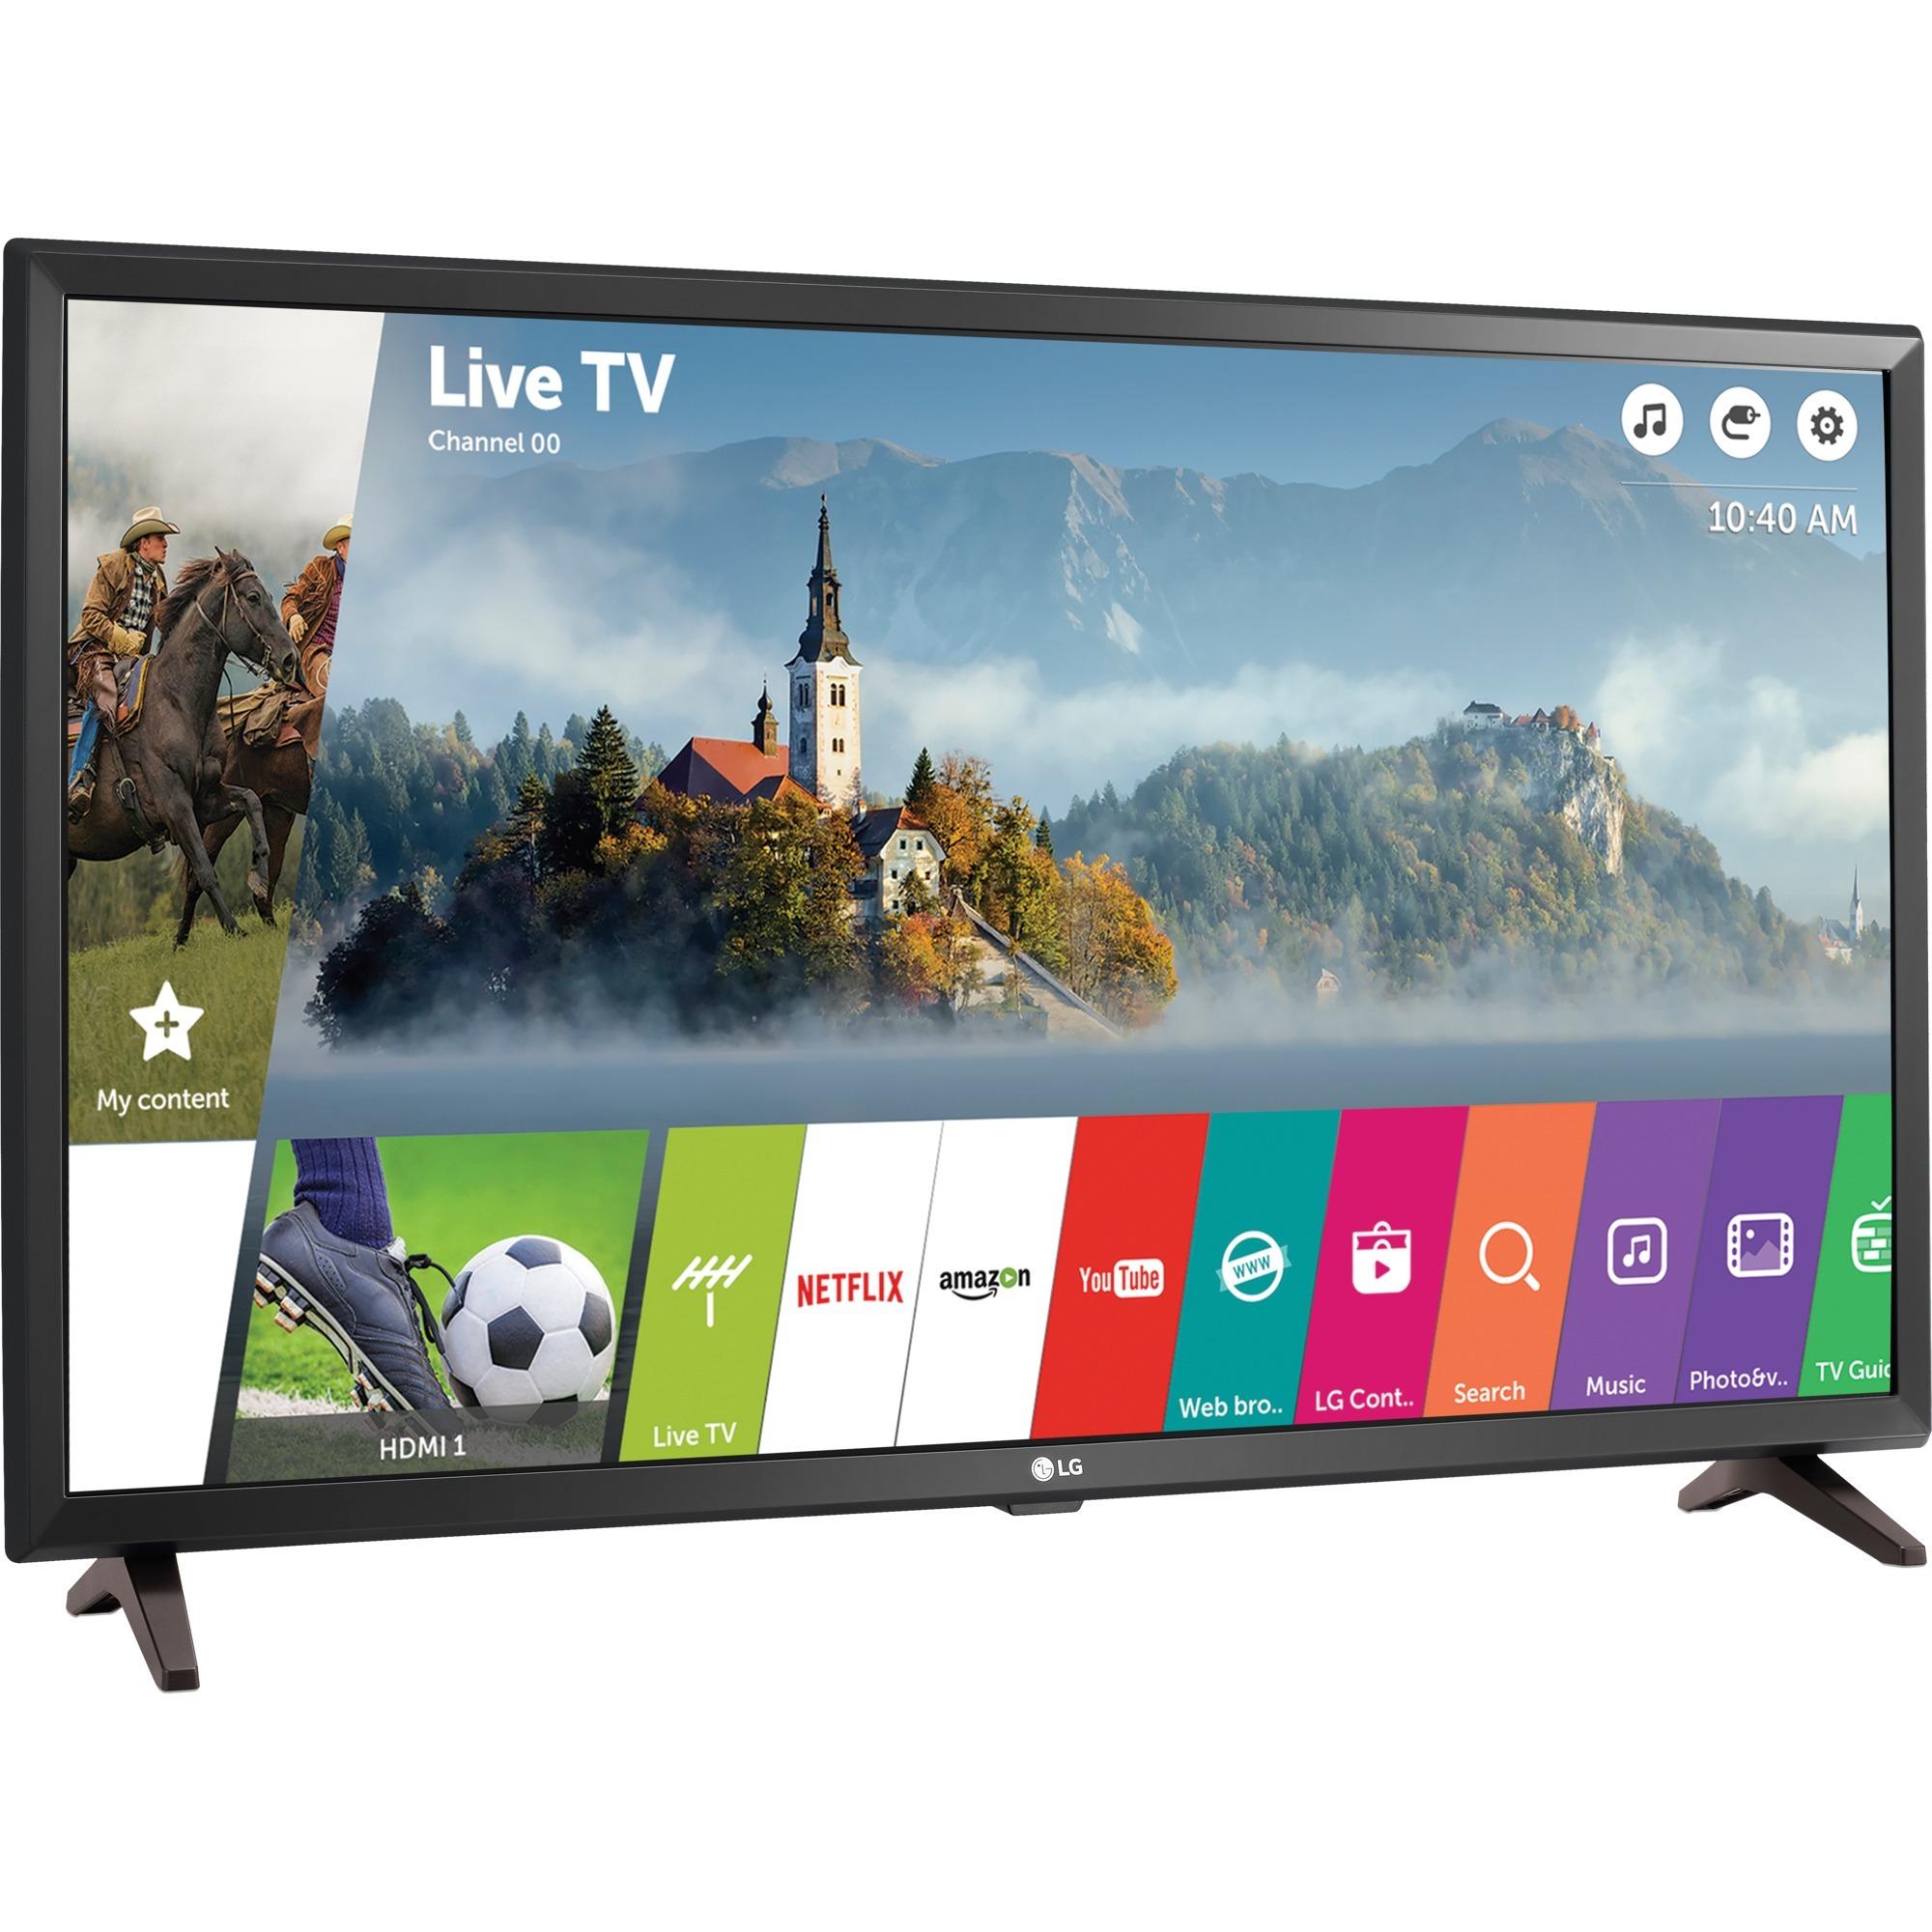 32LJ610V 32 Full HD Smart TV Wifi Noir écran LED, Téléviseur LED